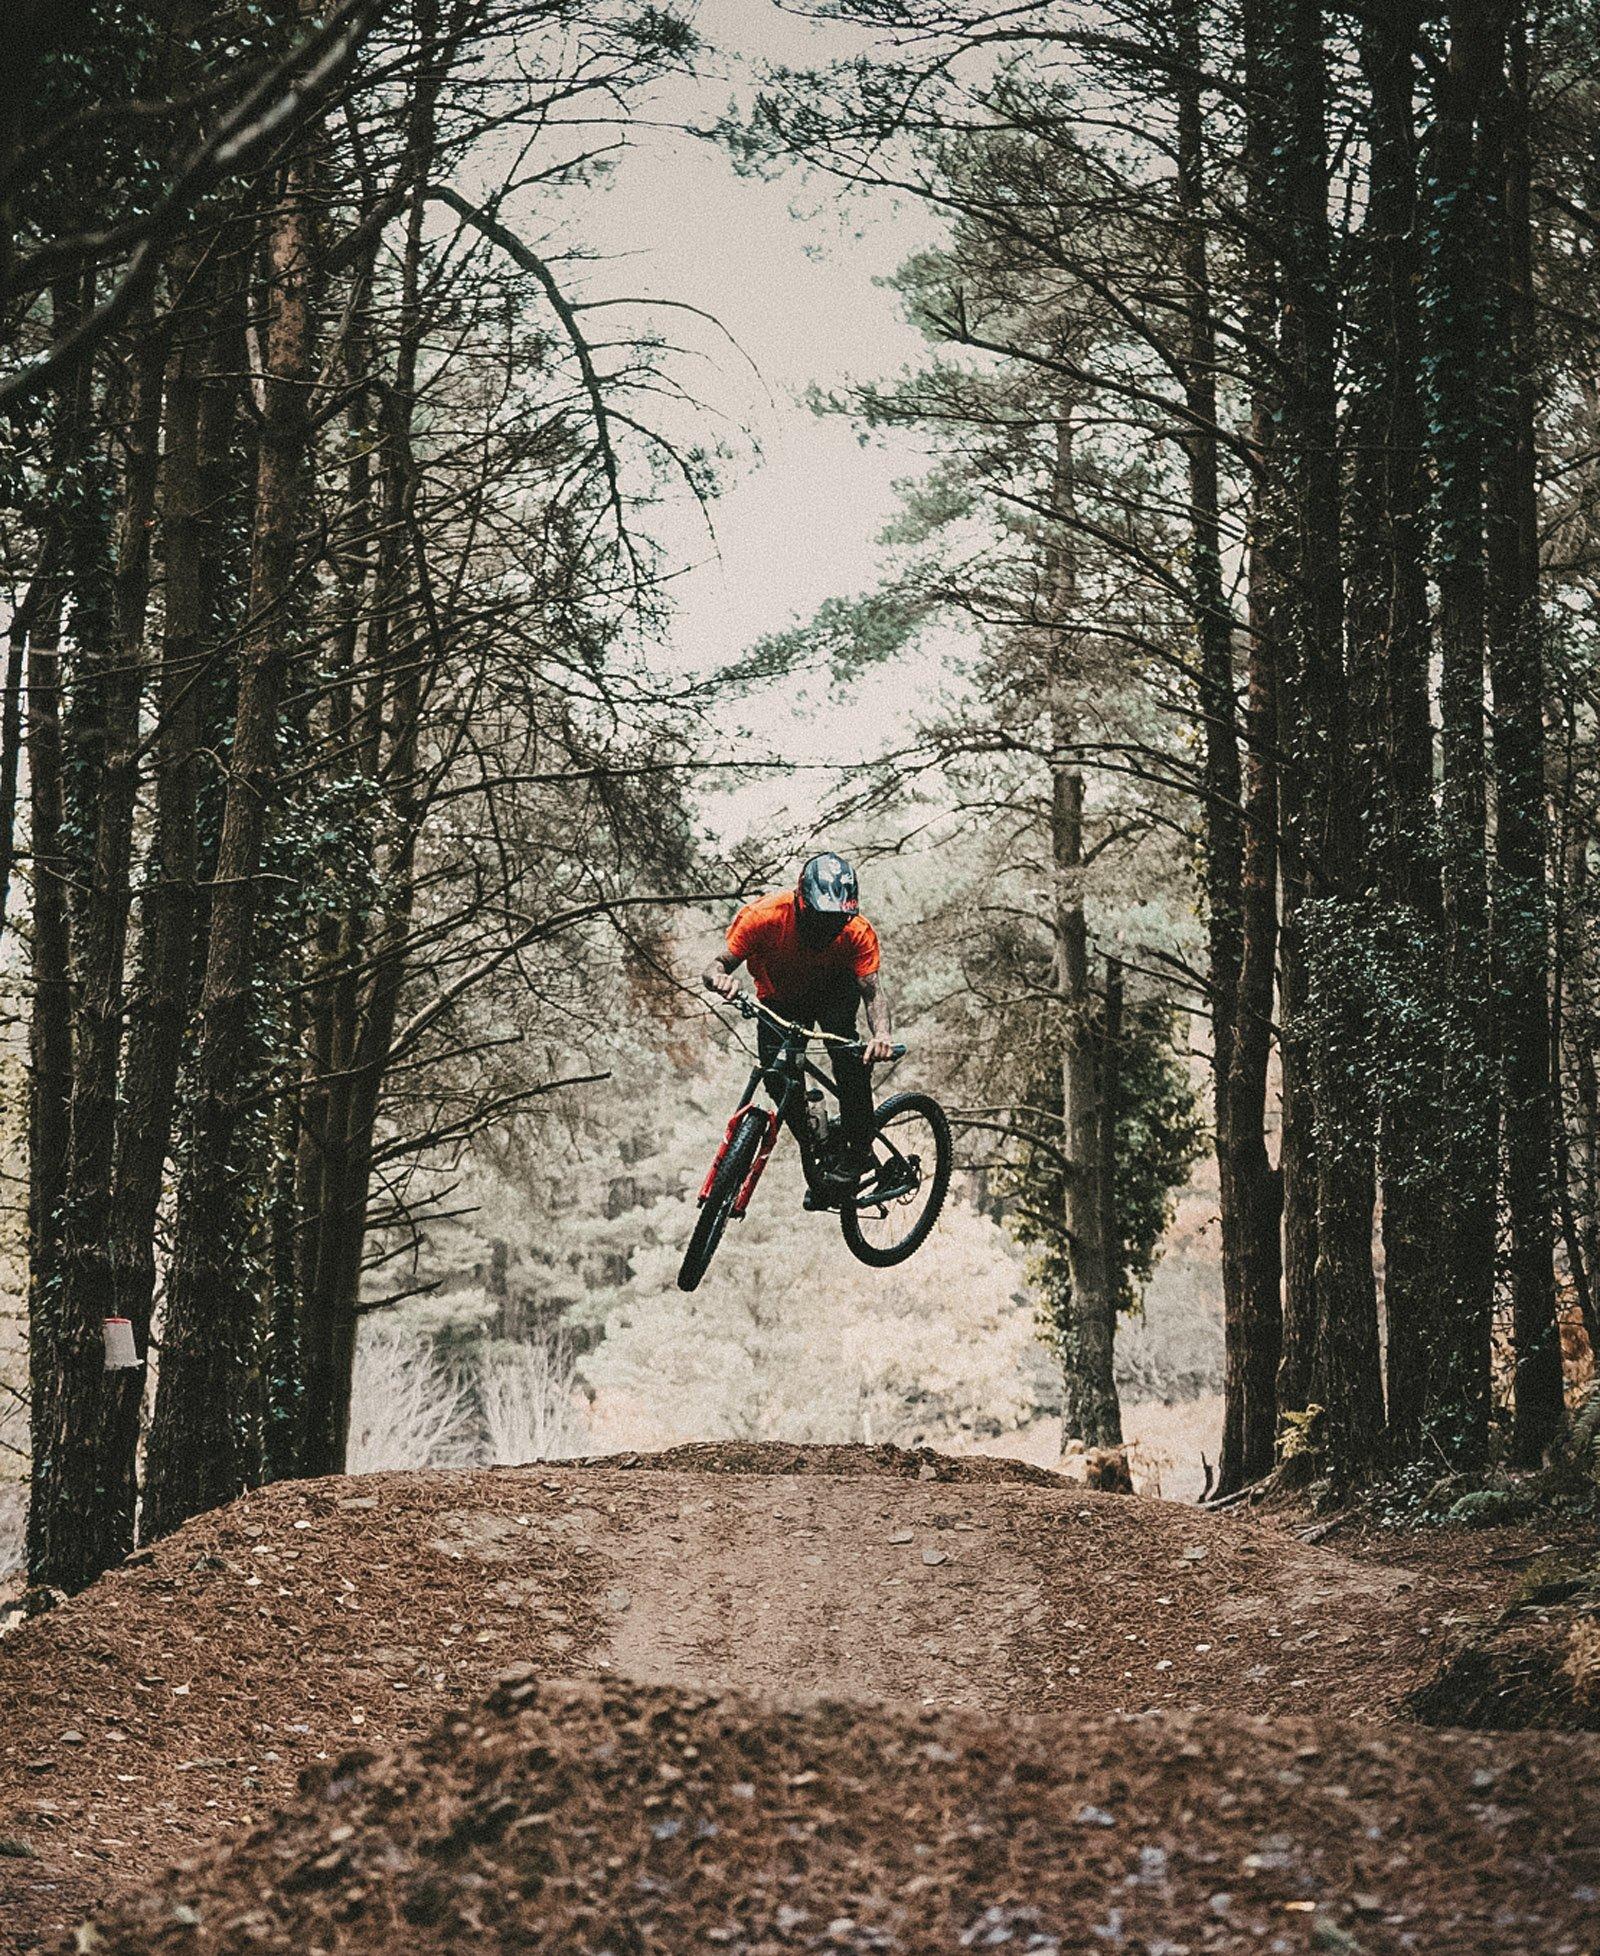 Mountain bike rider jumping on Goodyear tires